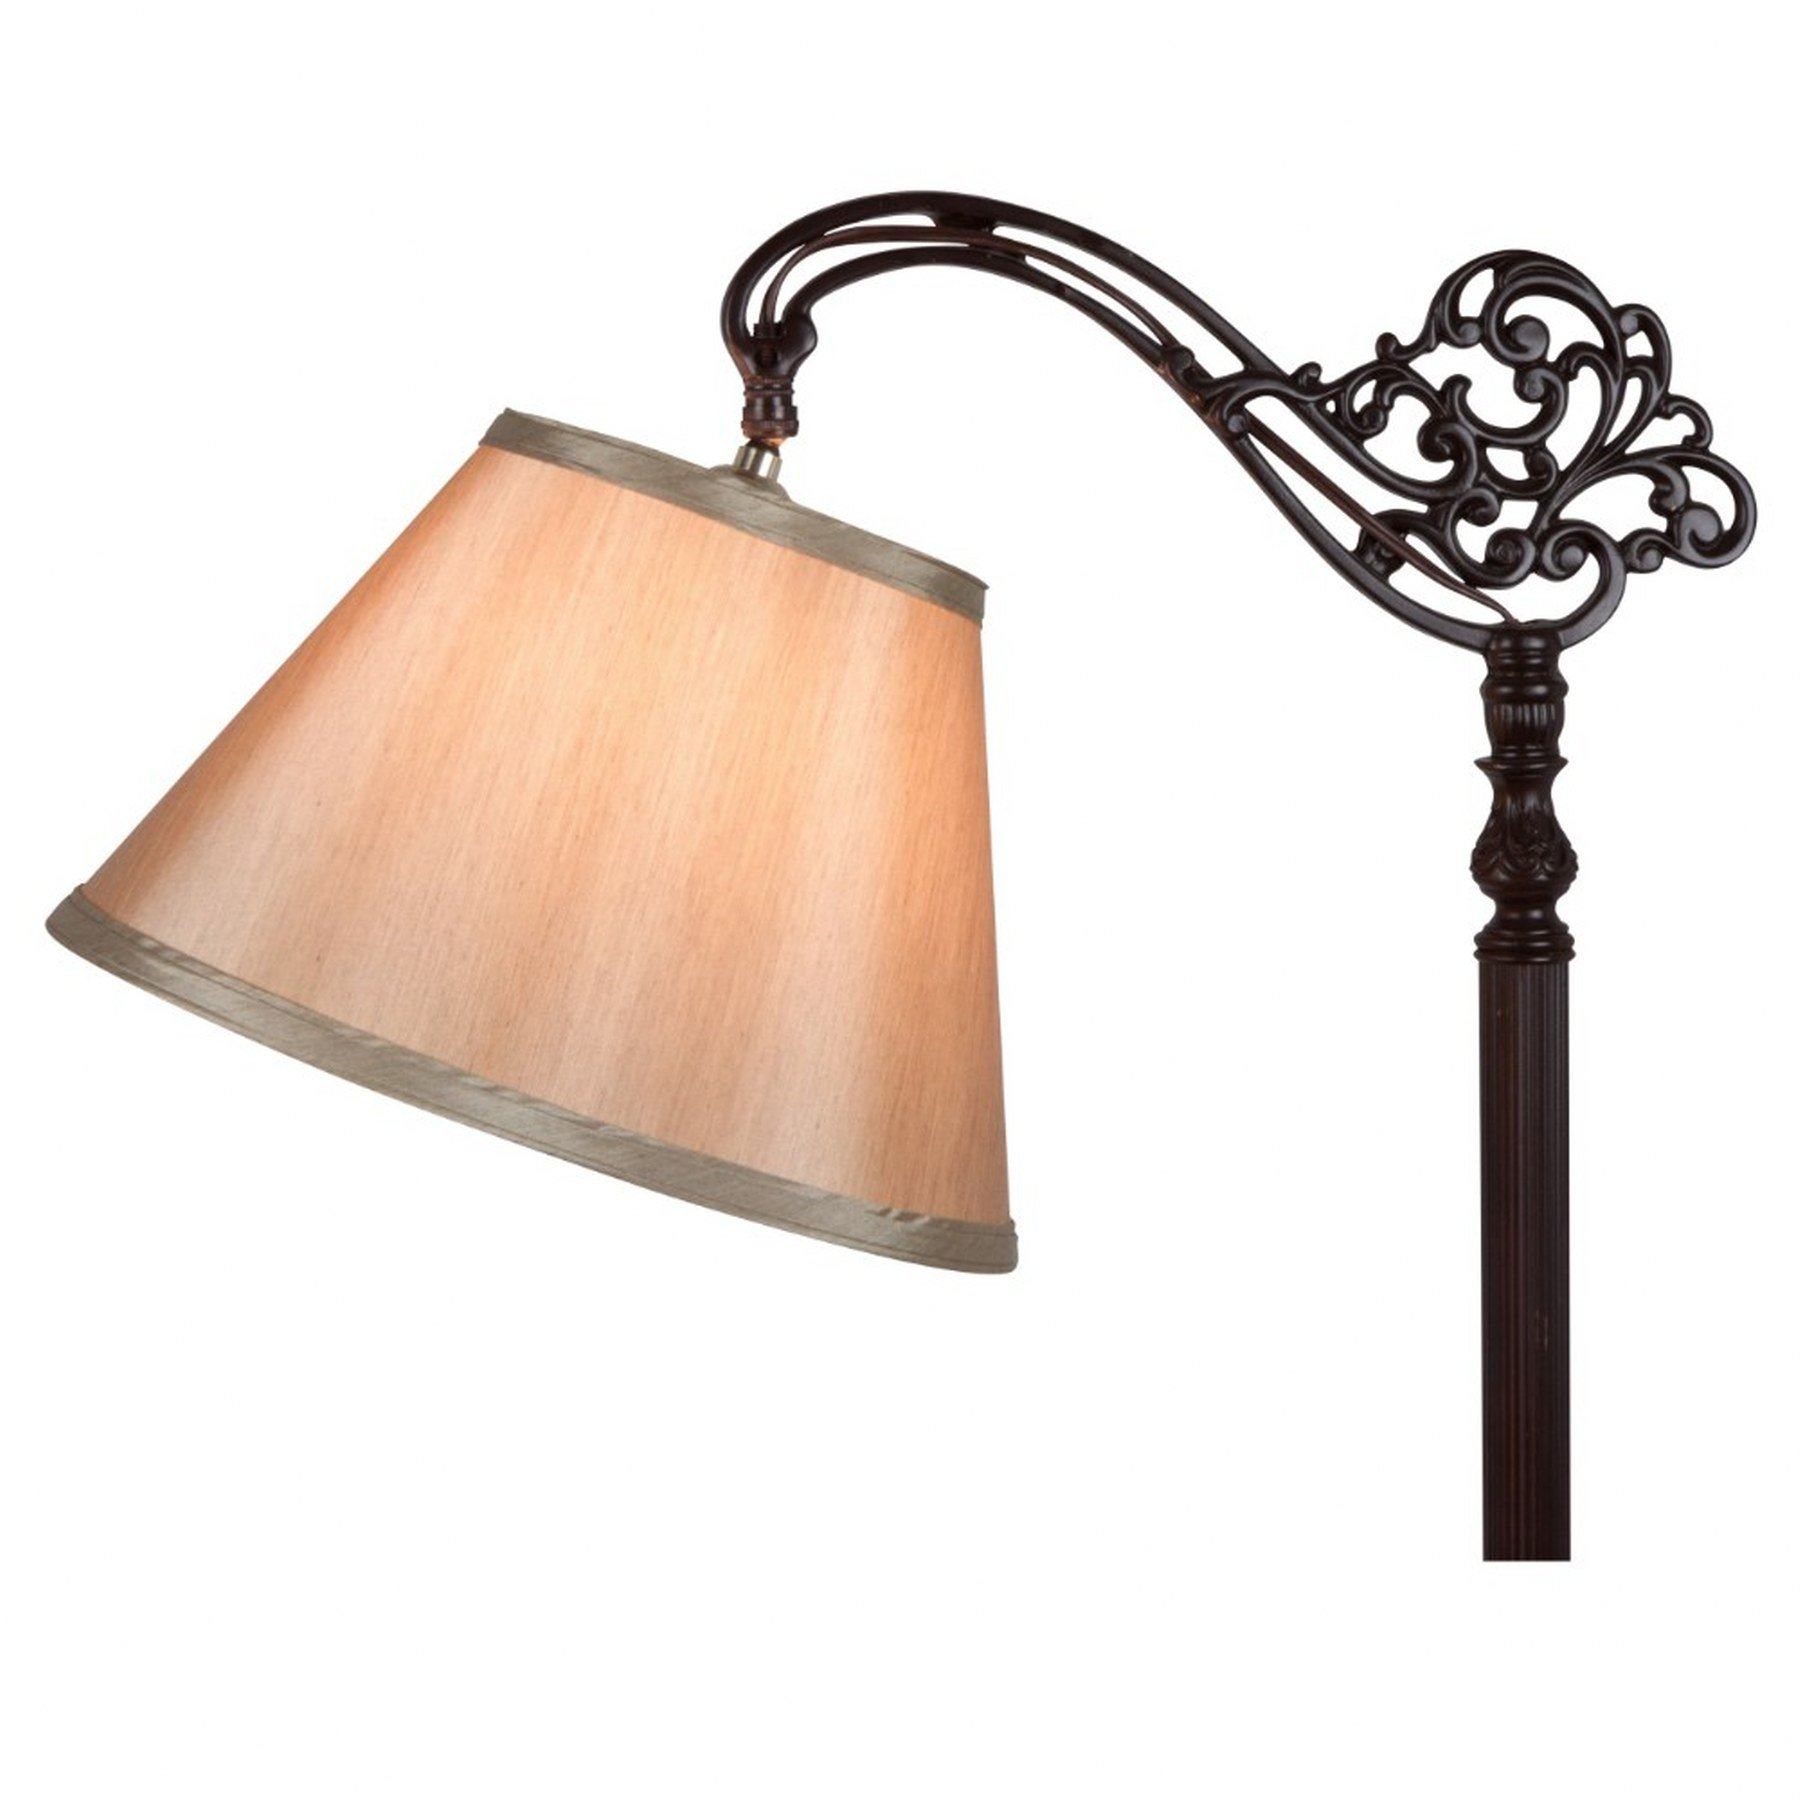 Upgradelights 12 Inch Bronze Uno Lamp Shade Downbridge (6x12x8) by Upgradelights